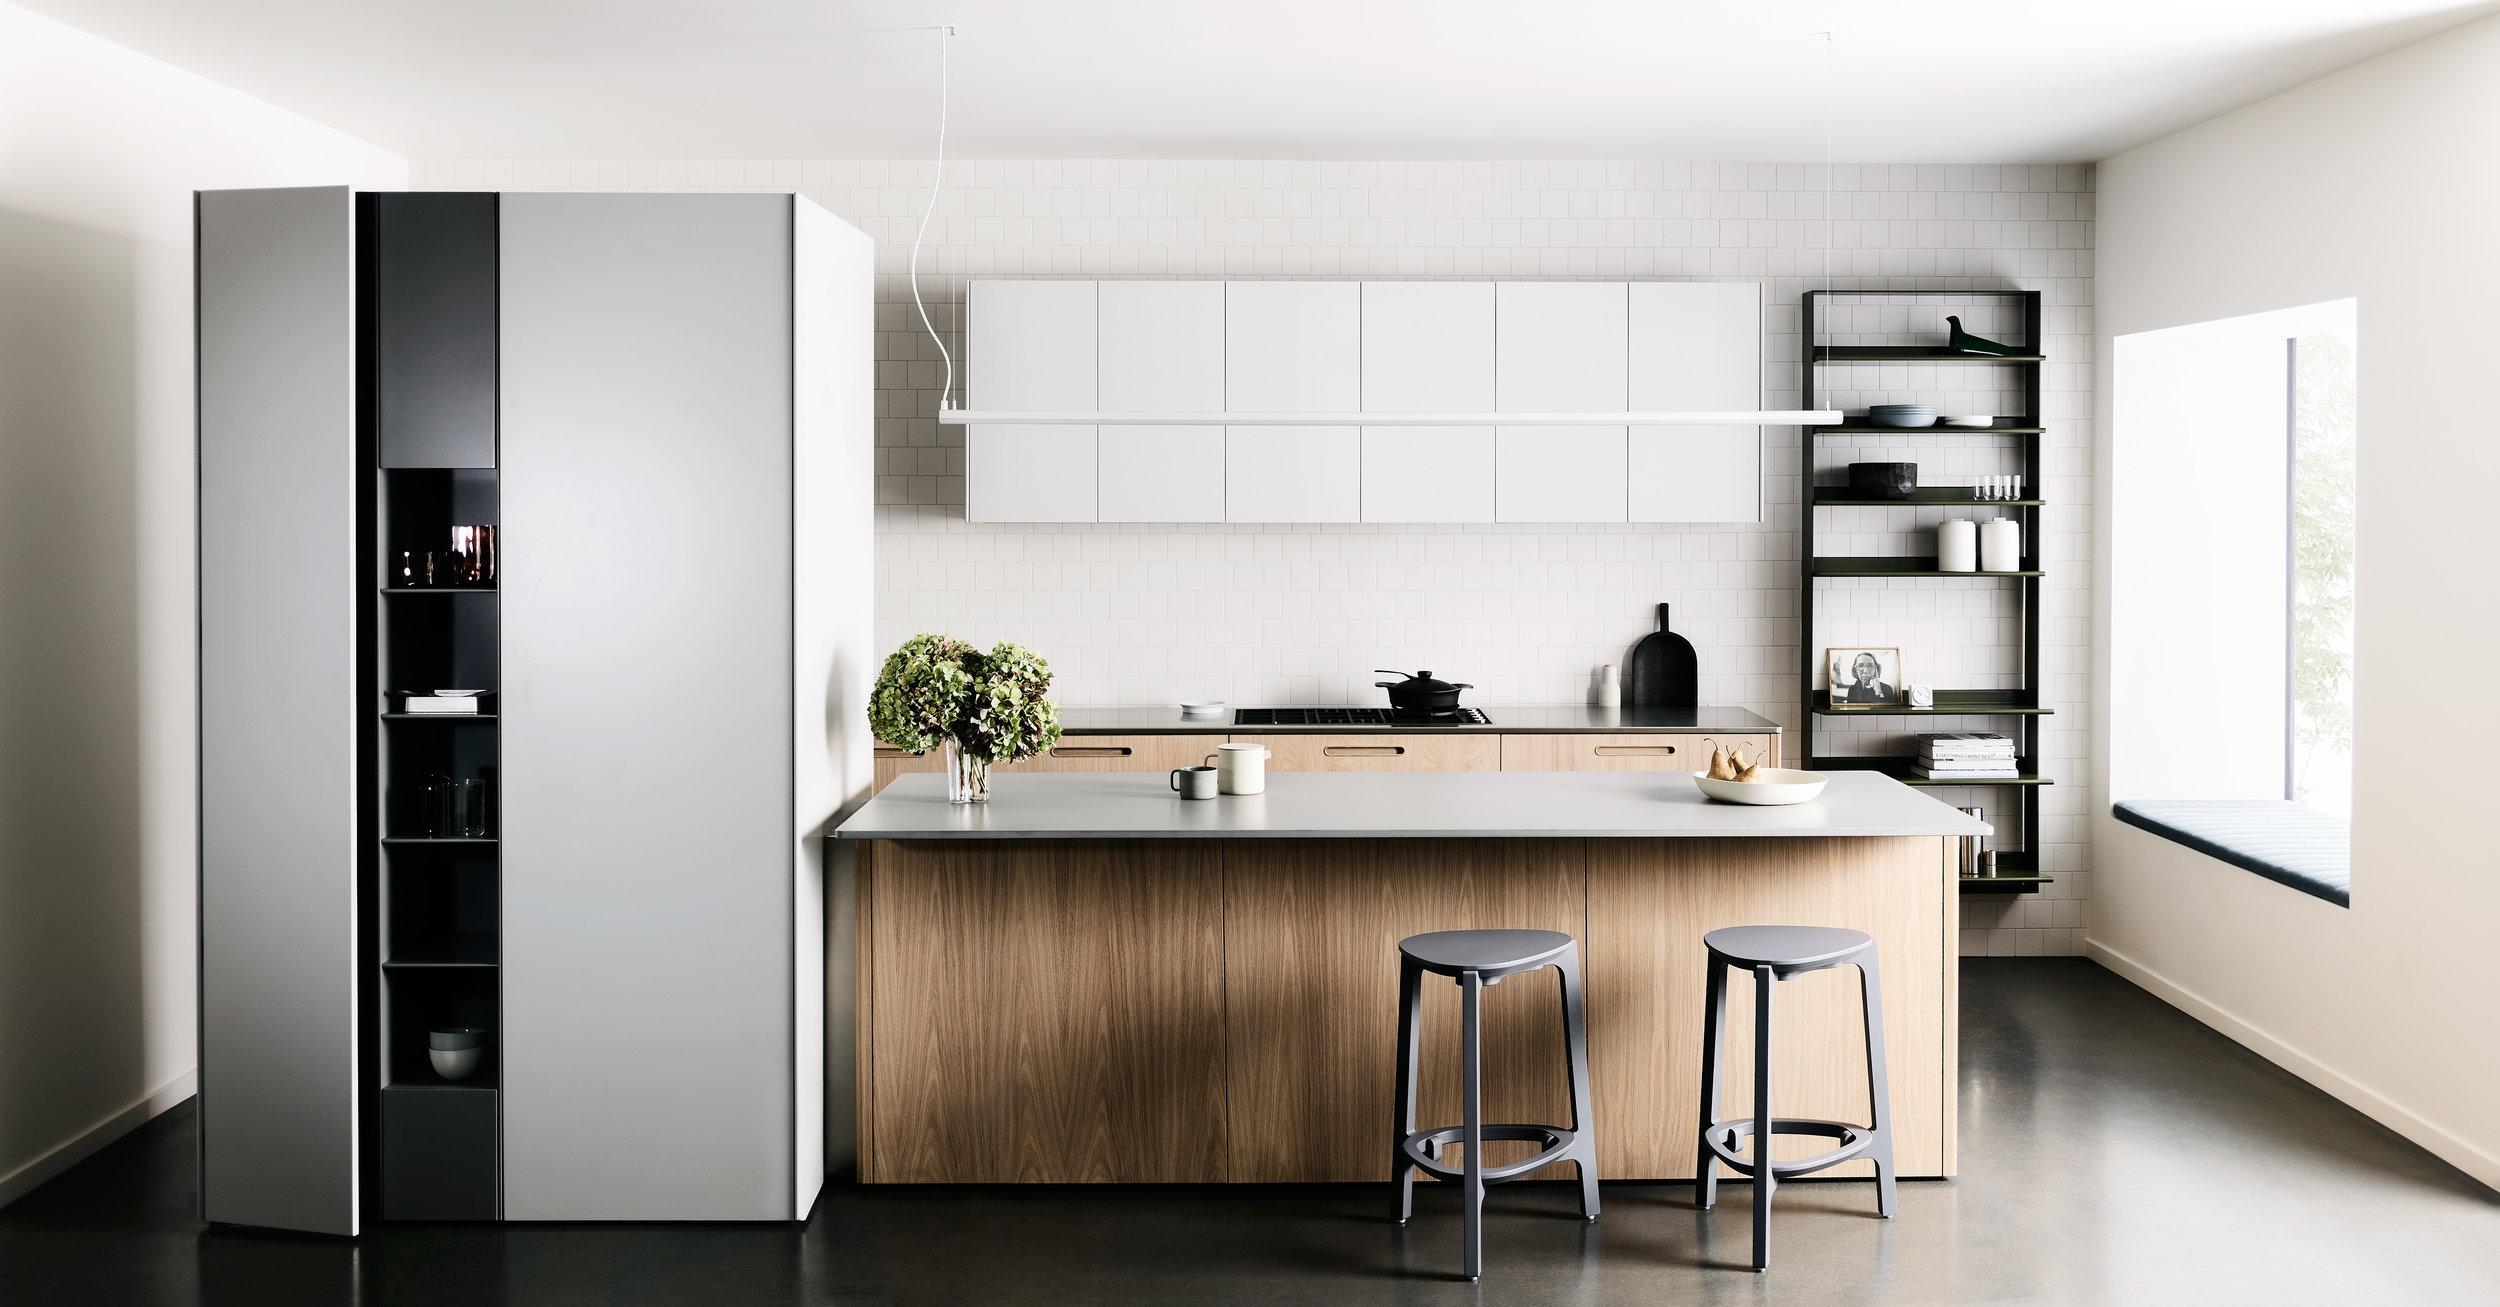 Tableau Cantilever DesignOffice Kitchen System Australia (3).jpg